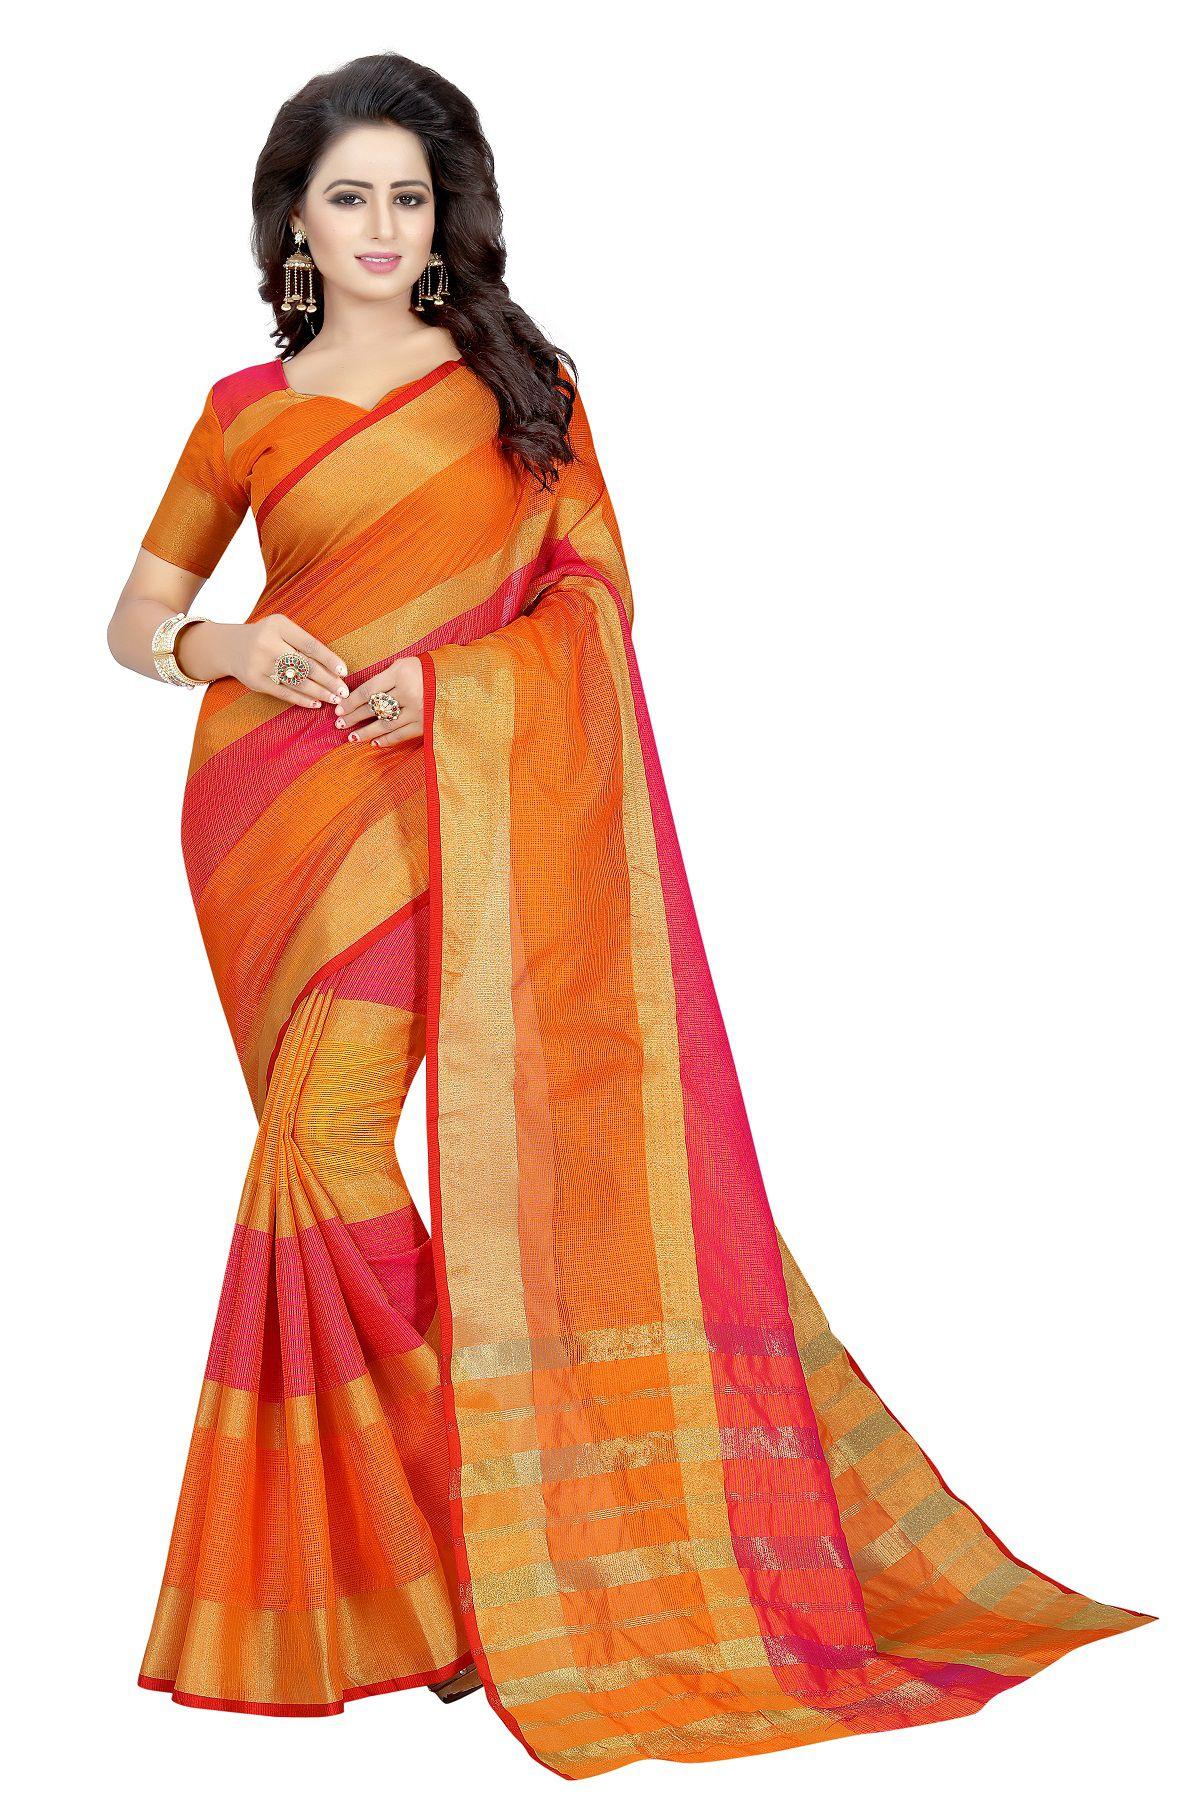 Active Feel Free Life Orange Cotton Silk Saree